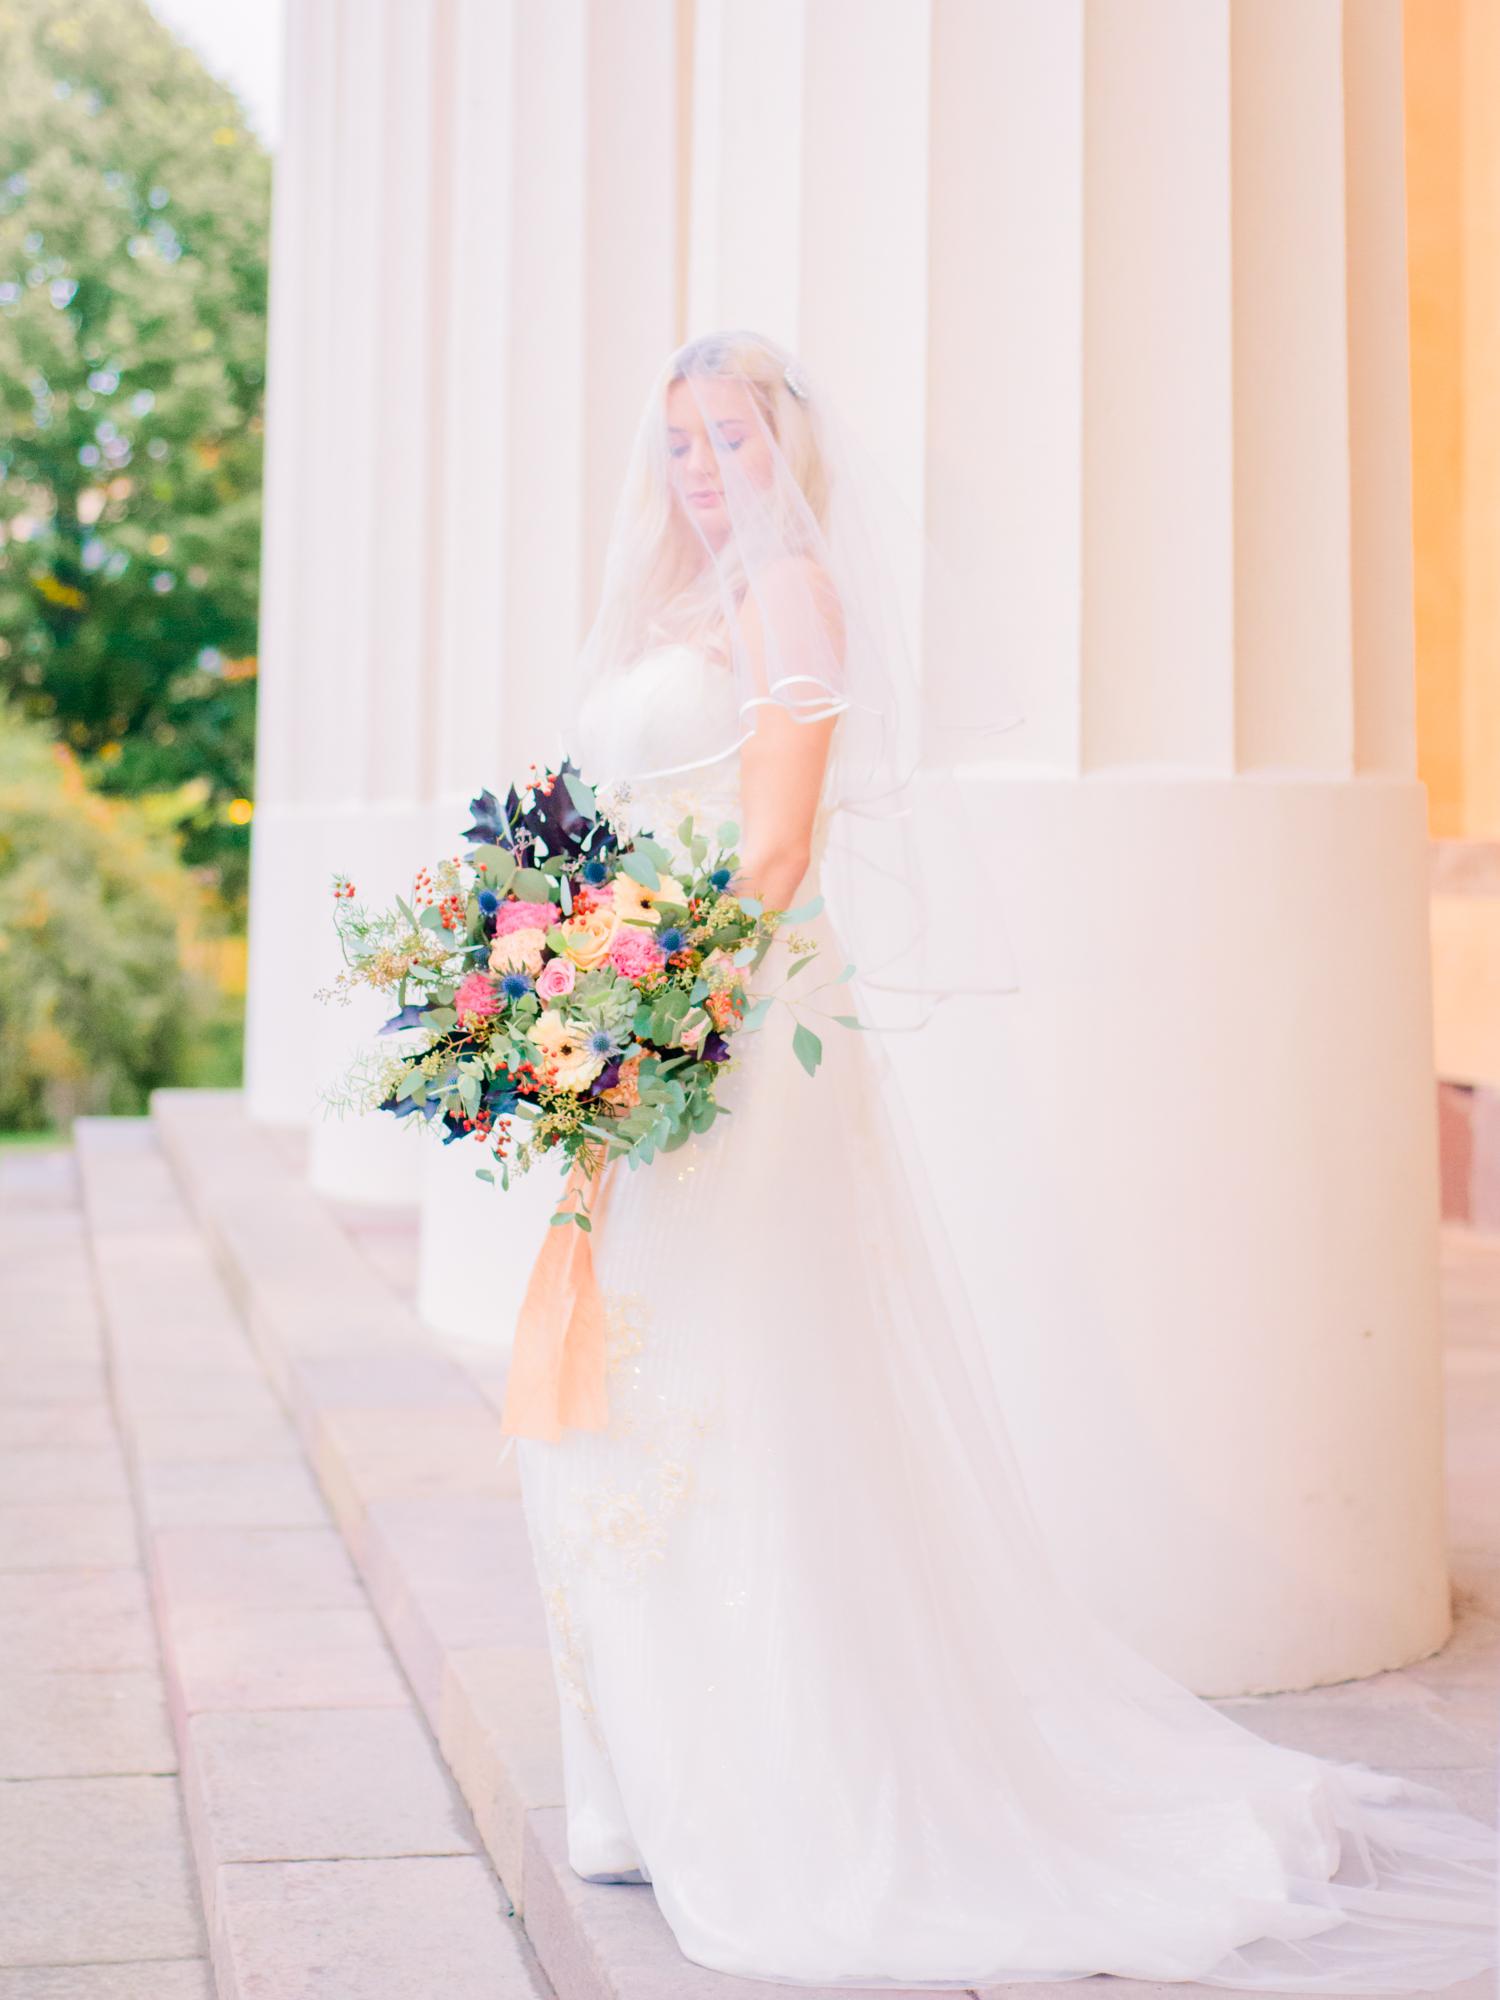 Elegant Organic Fall Swedish Bridal Wedding Styled Shoot - Erika Alvarenga Photography-65.jpg